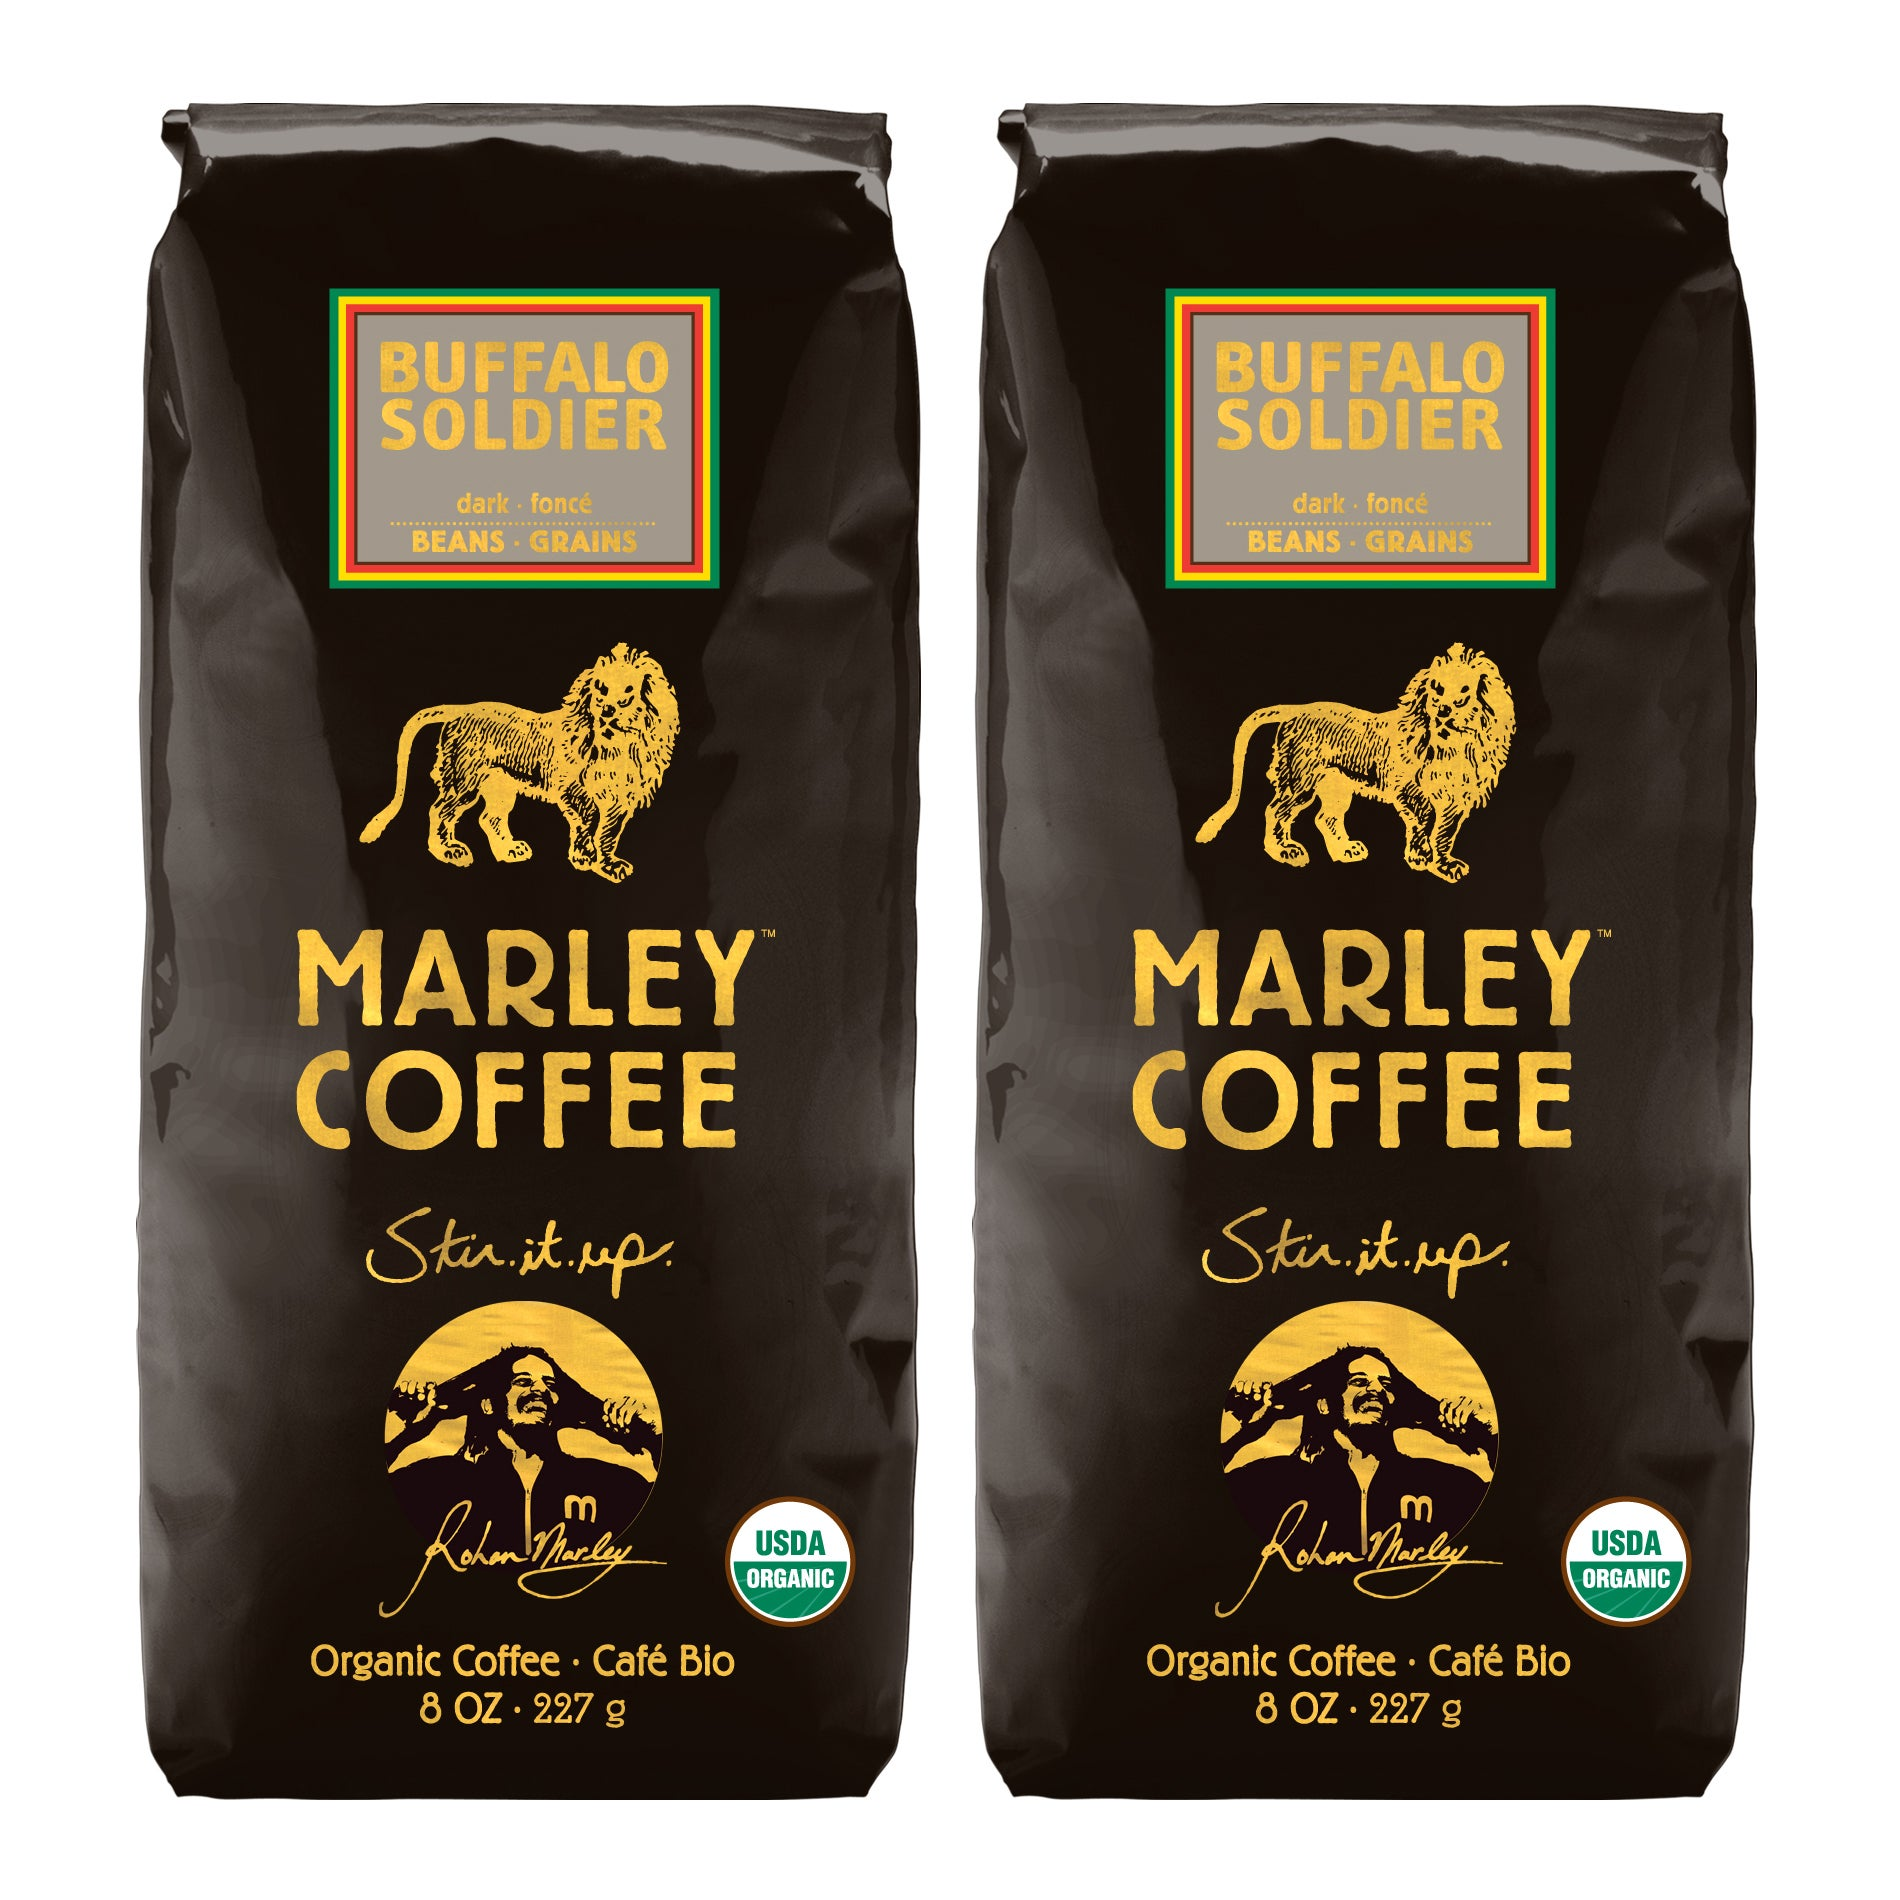 Marley Coffee Buffalo Soldier Whole Bean Coffee (1 Pound)